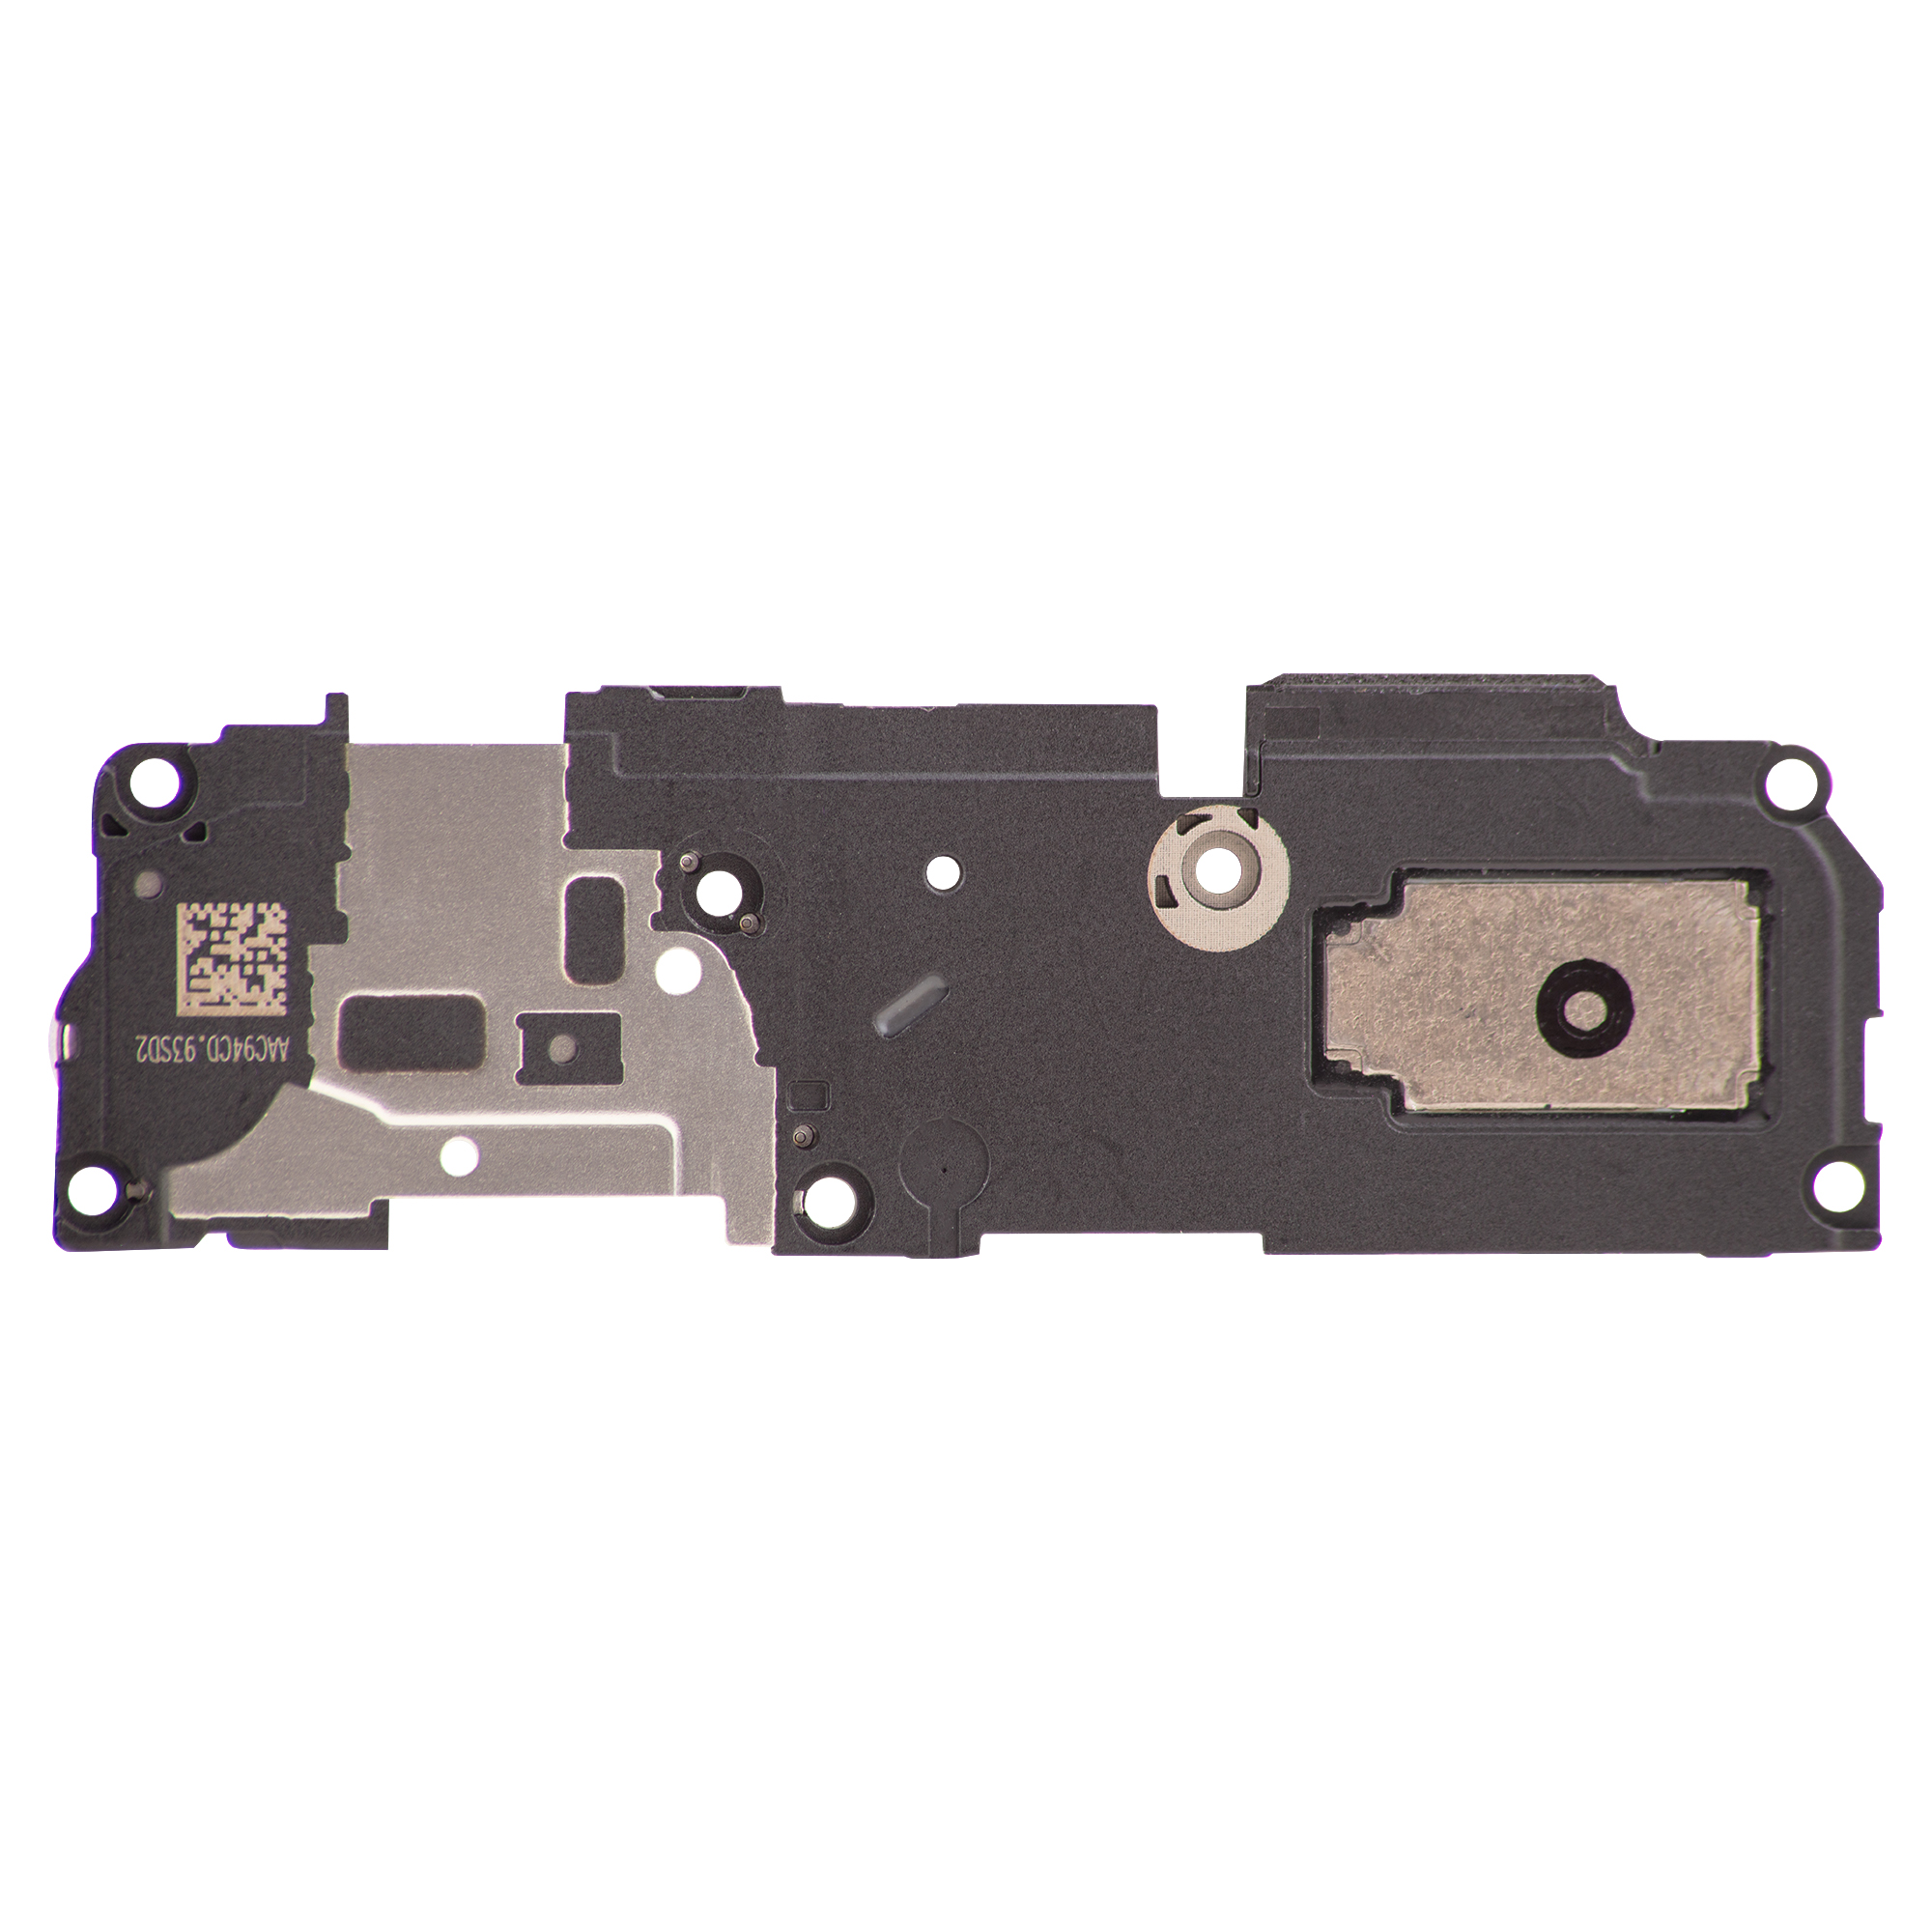 Huawei P20 Lite Reproduktor Modul (Service Pack)